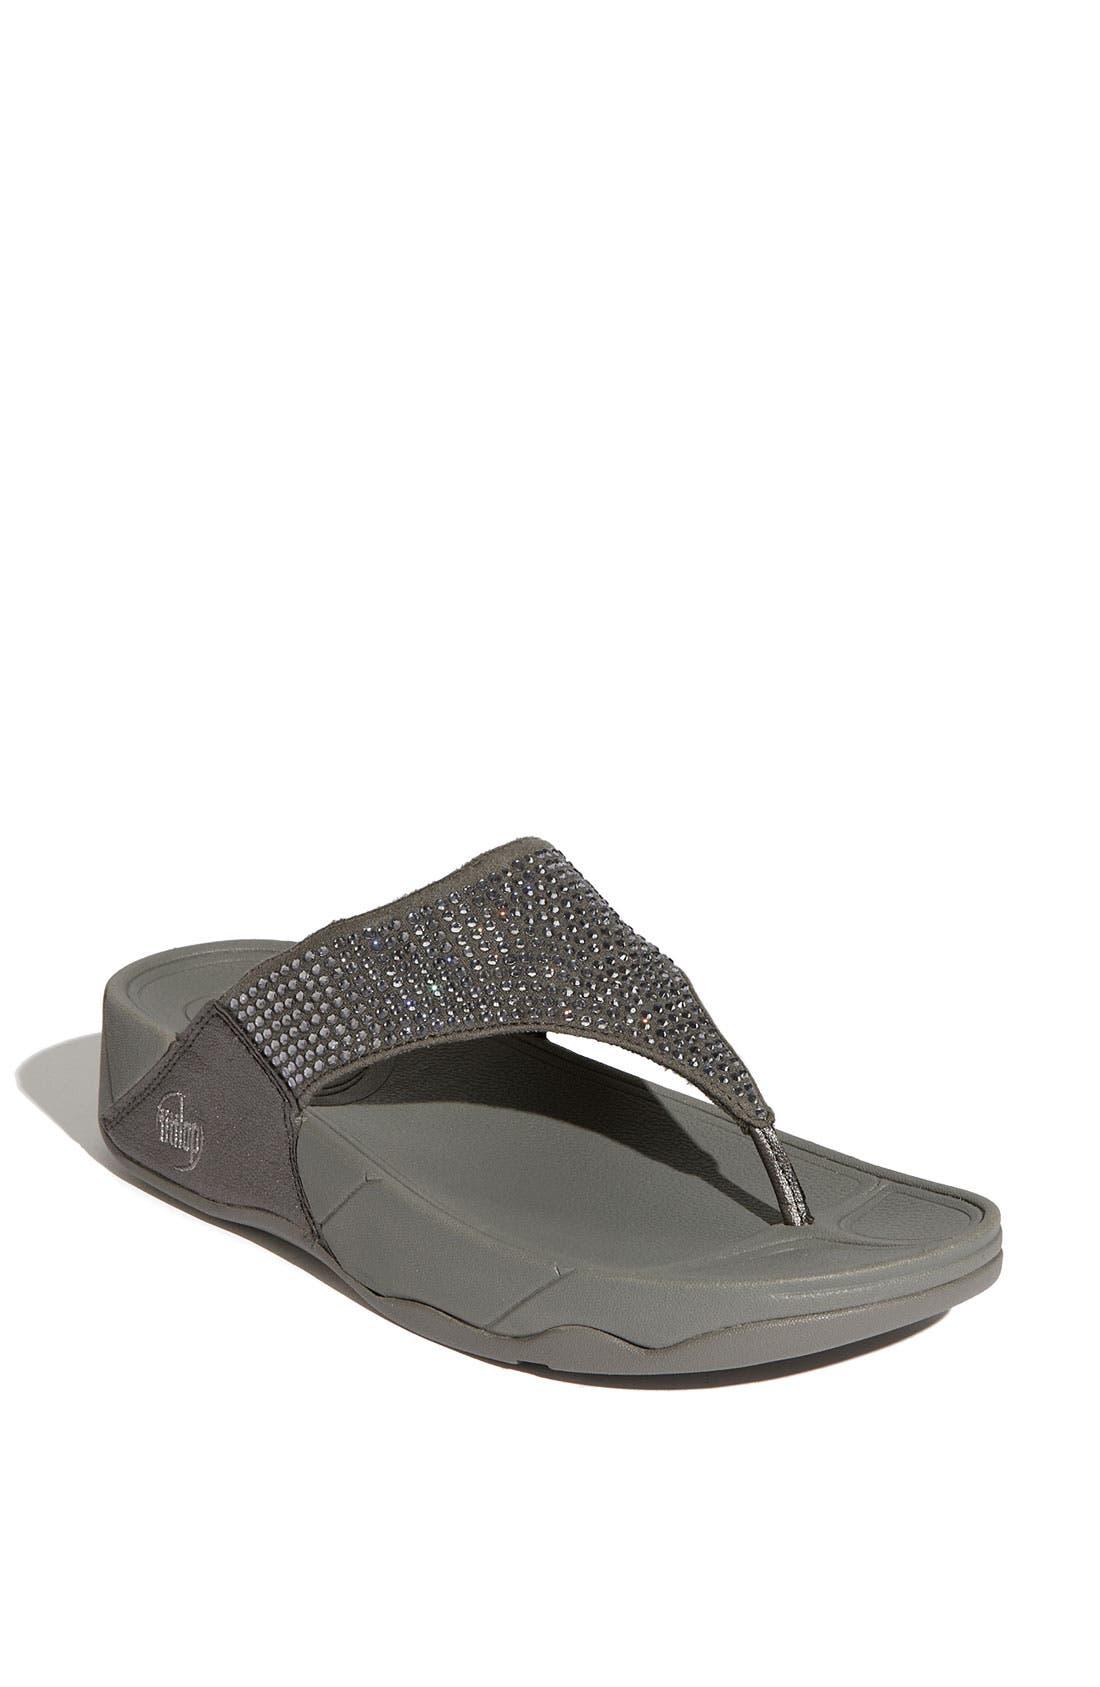 Alternate Image 1 Selected - FitFlop 'Rokkit' Sandal